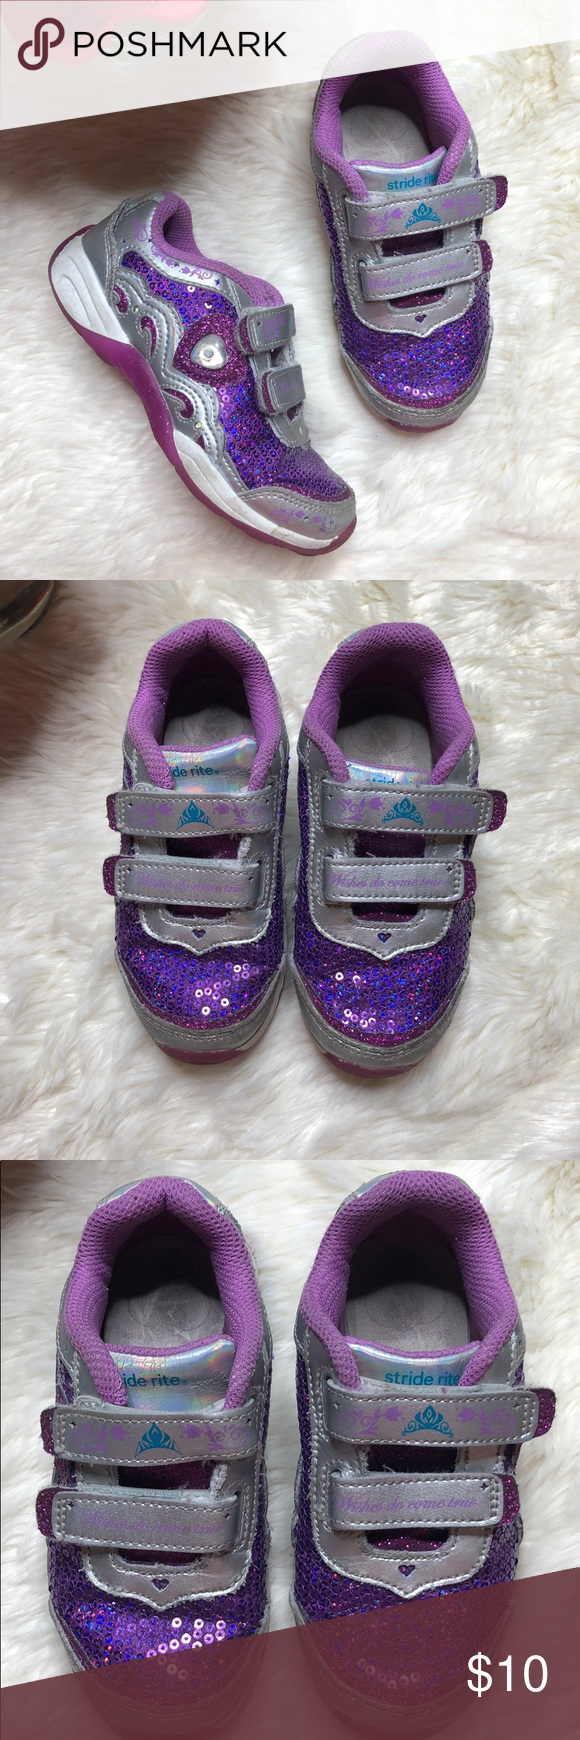 Stride Rite Disney Frozen Velcro Shoes